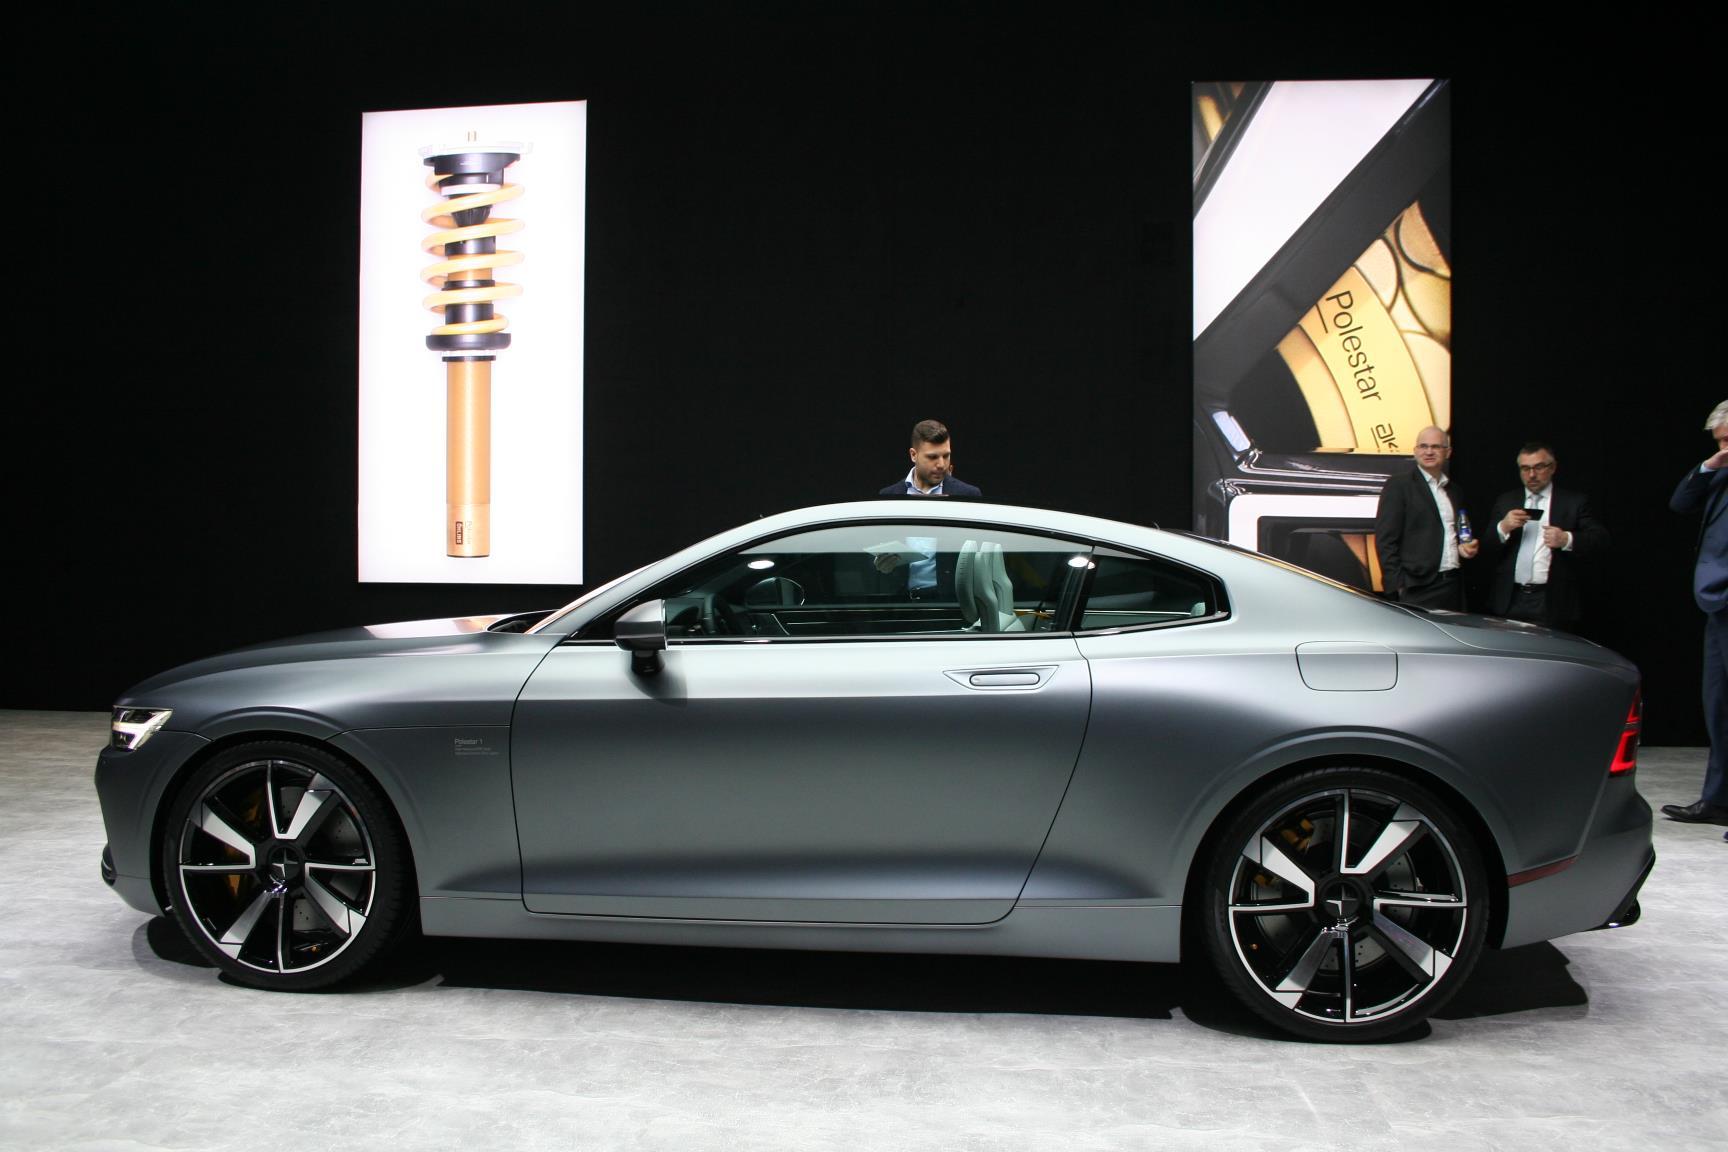 Geneva Motor Show 2018 Mega Gallery Part 1 (140)